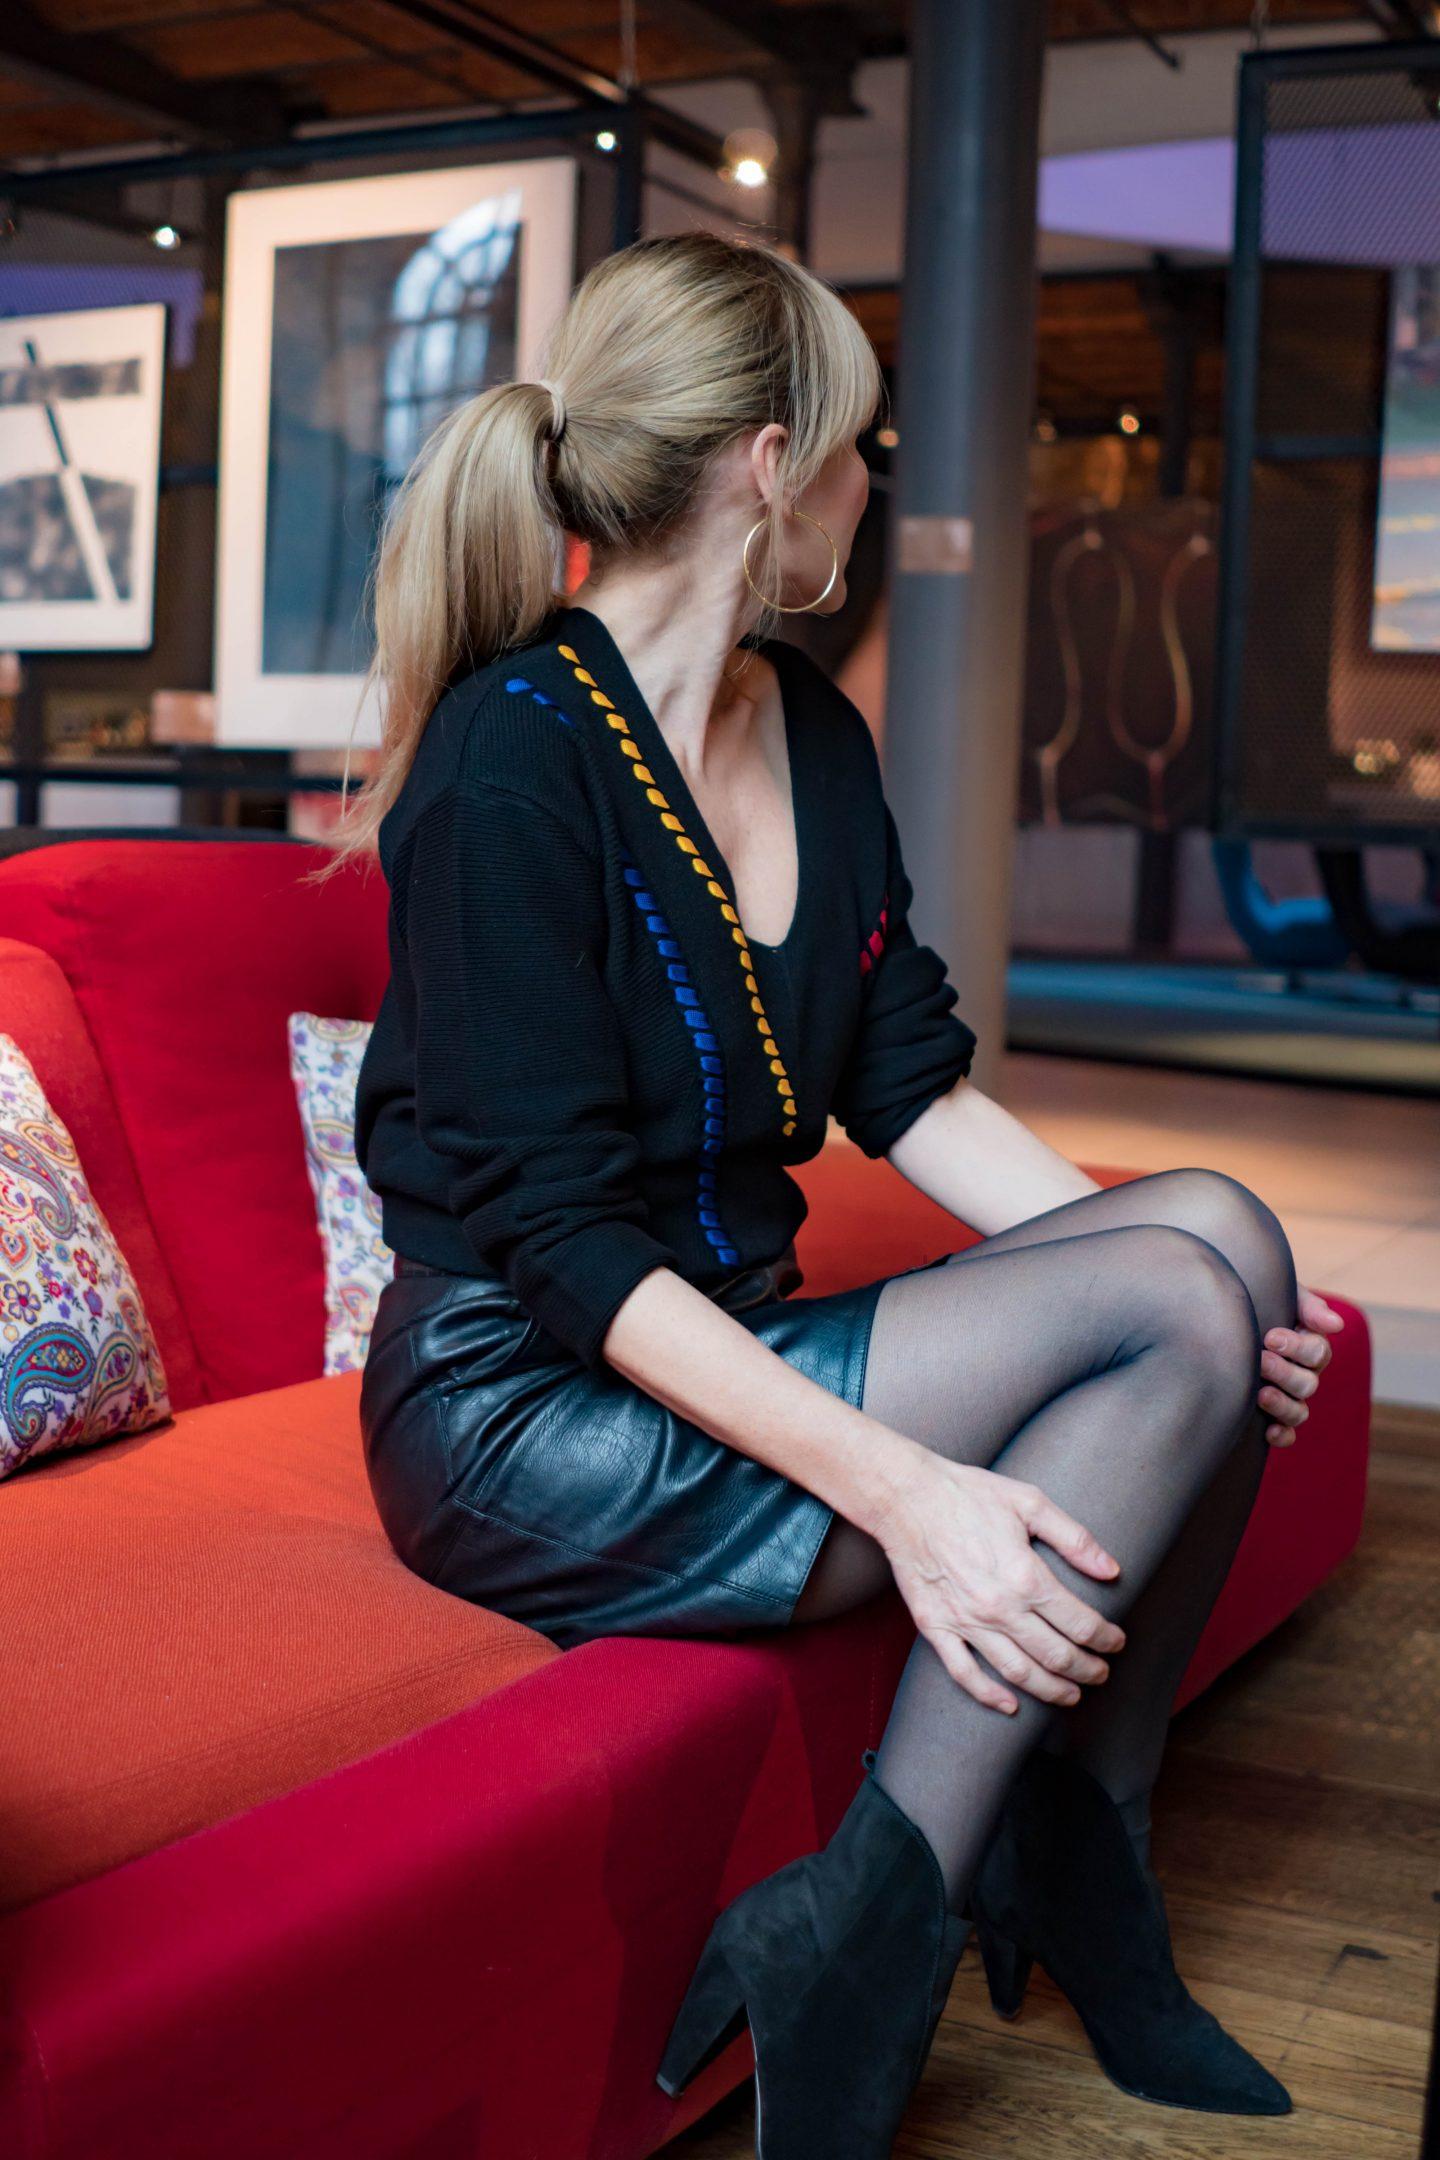 Lederrock-schwarzer V-Ausschnitt Pullover-Nowshine ü40 Blog im Andels Hotel Lodz